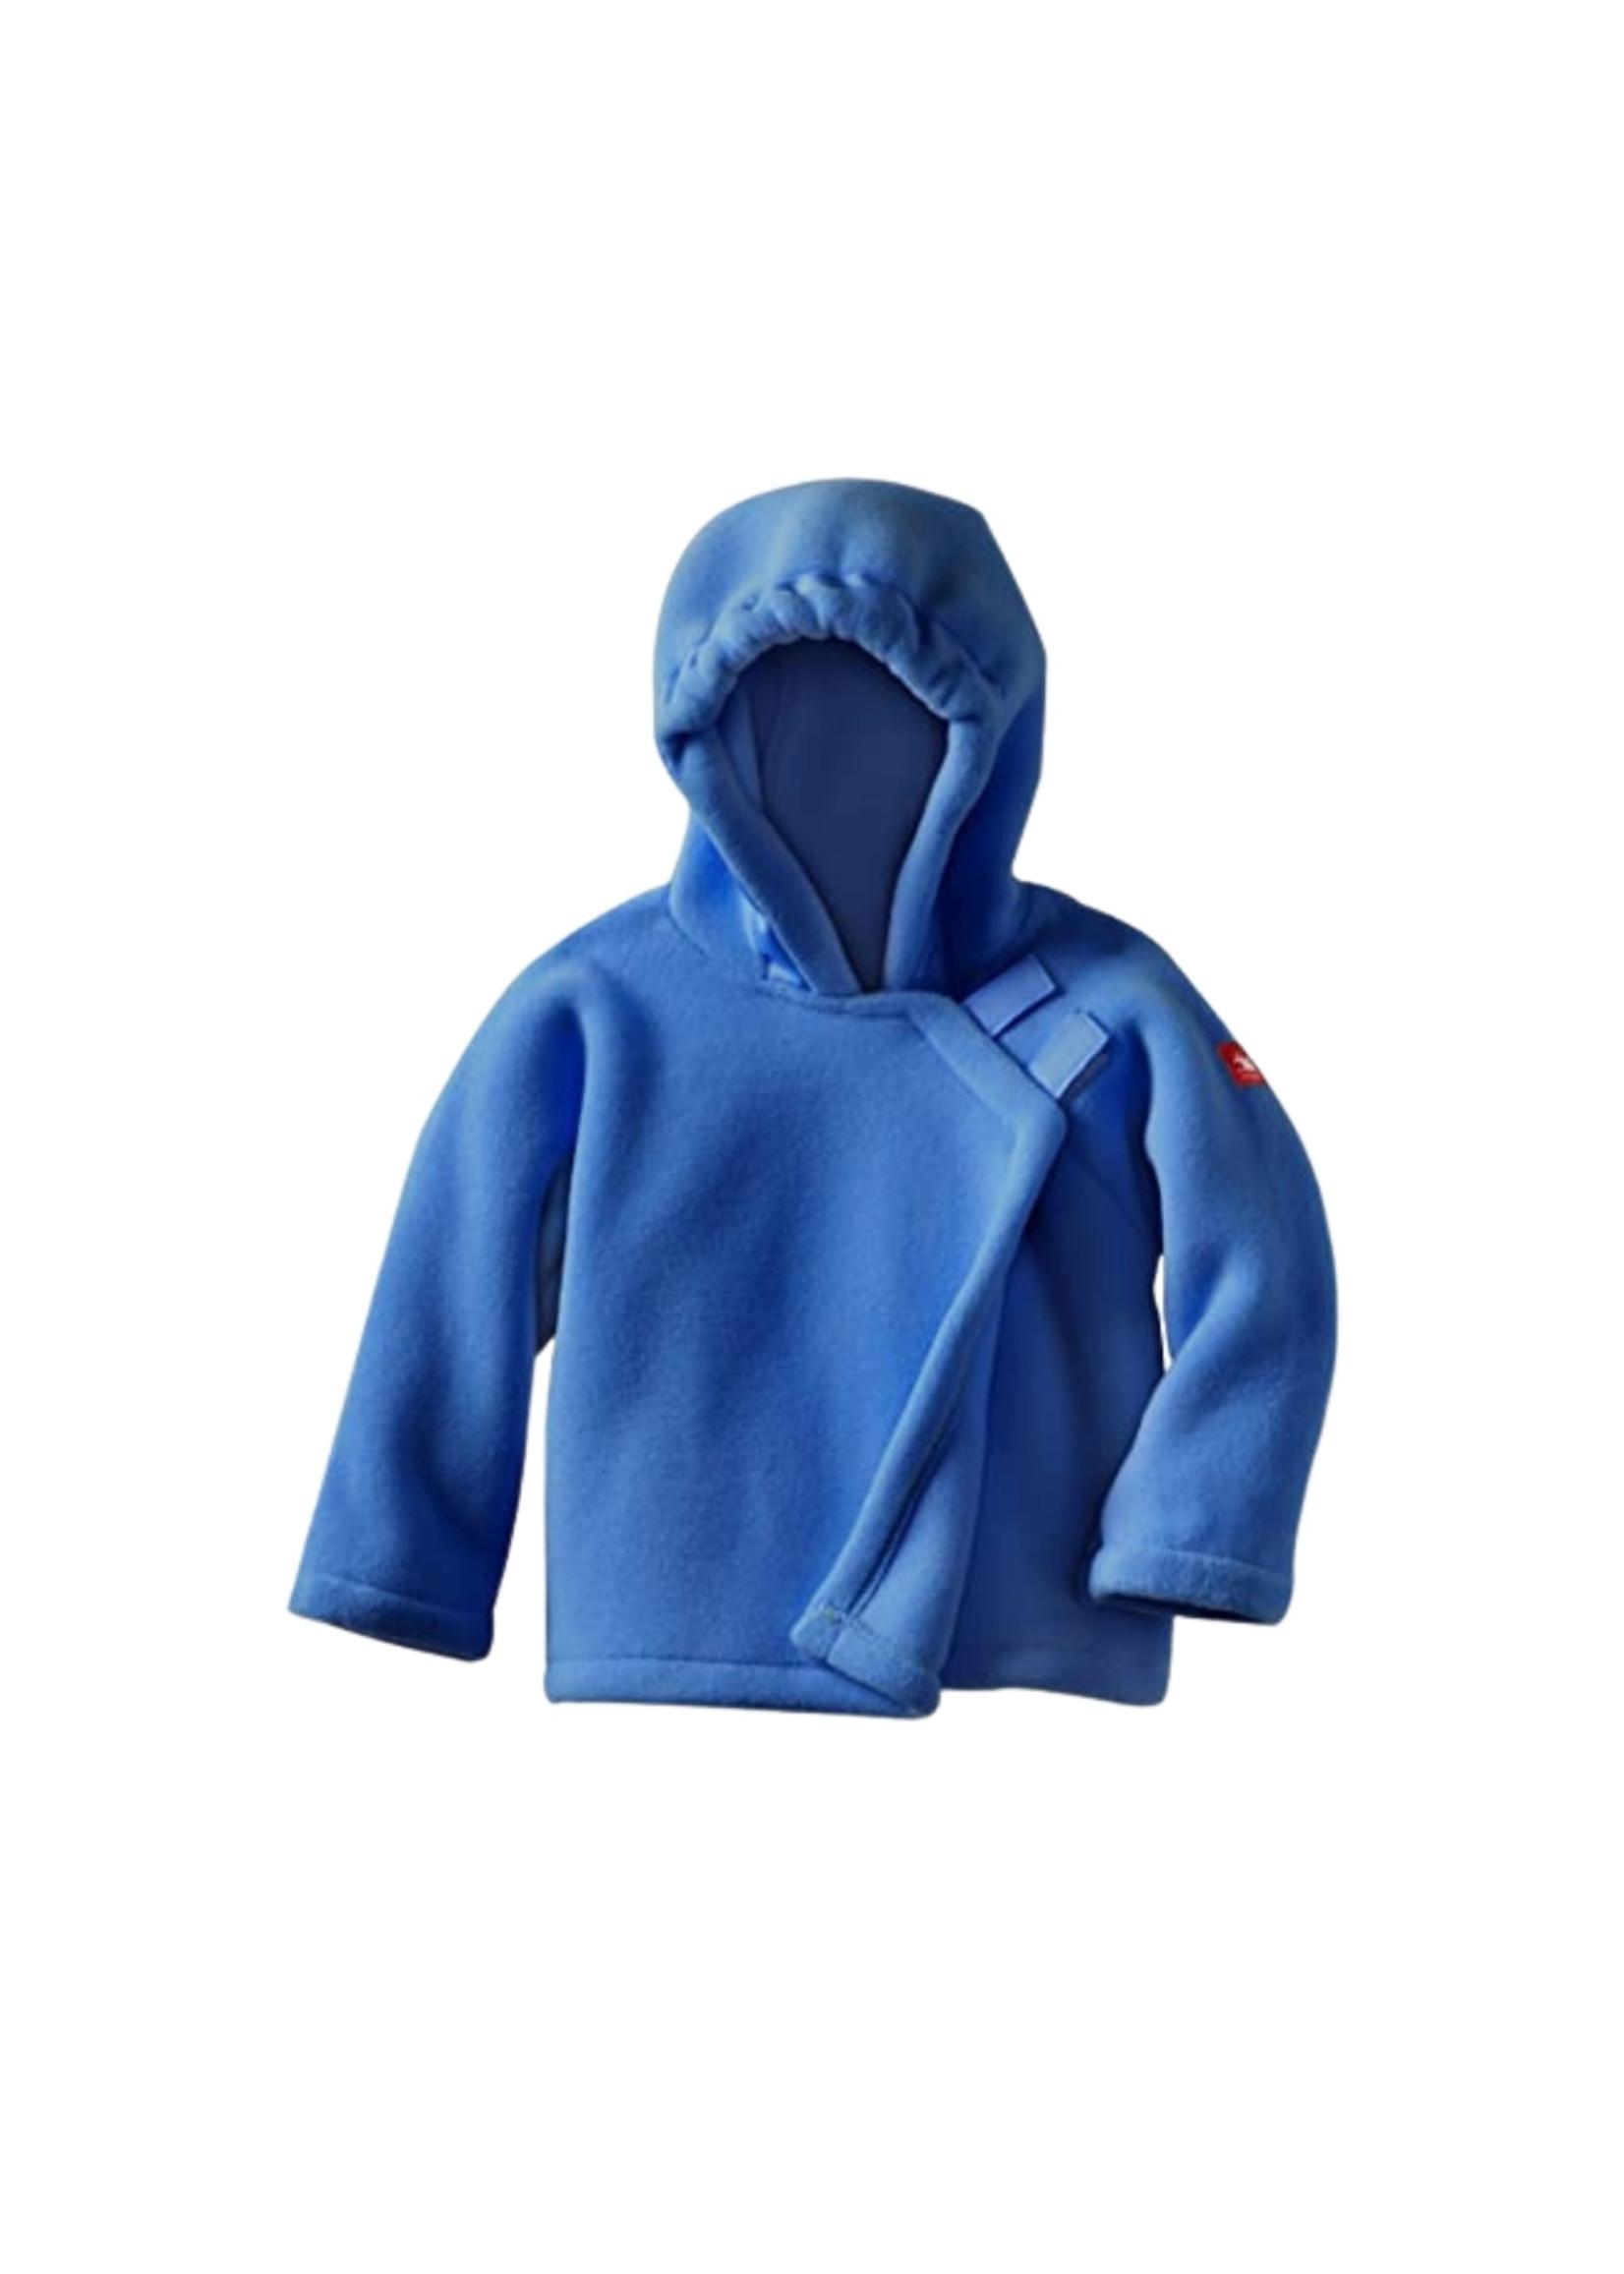 American Widgeon Widgeon Warmplus Royal Blue Hooded Fleece Jacket